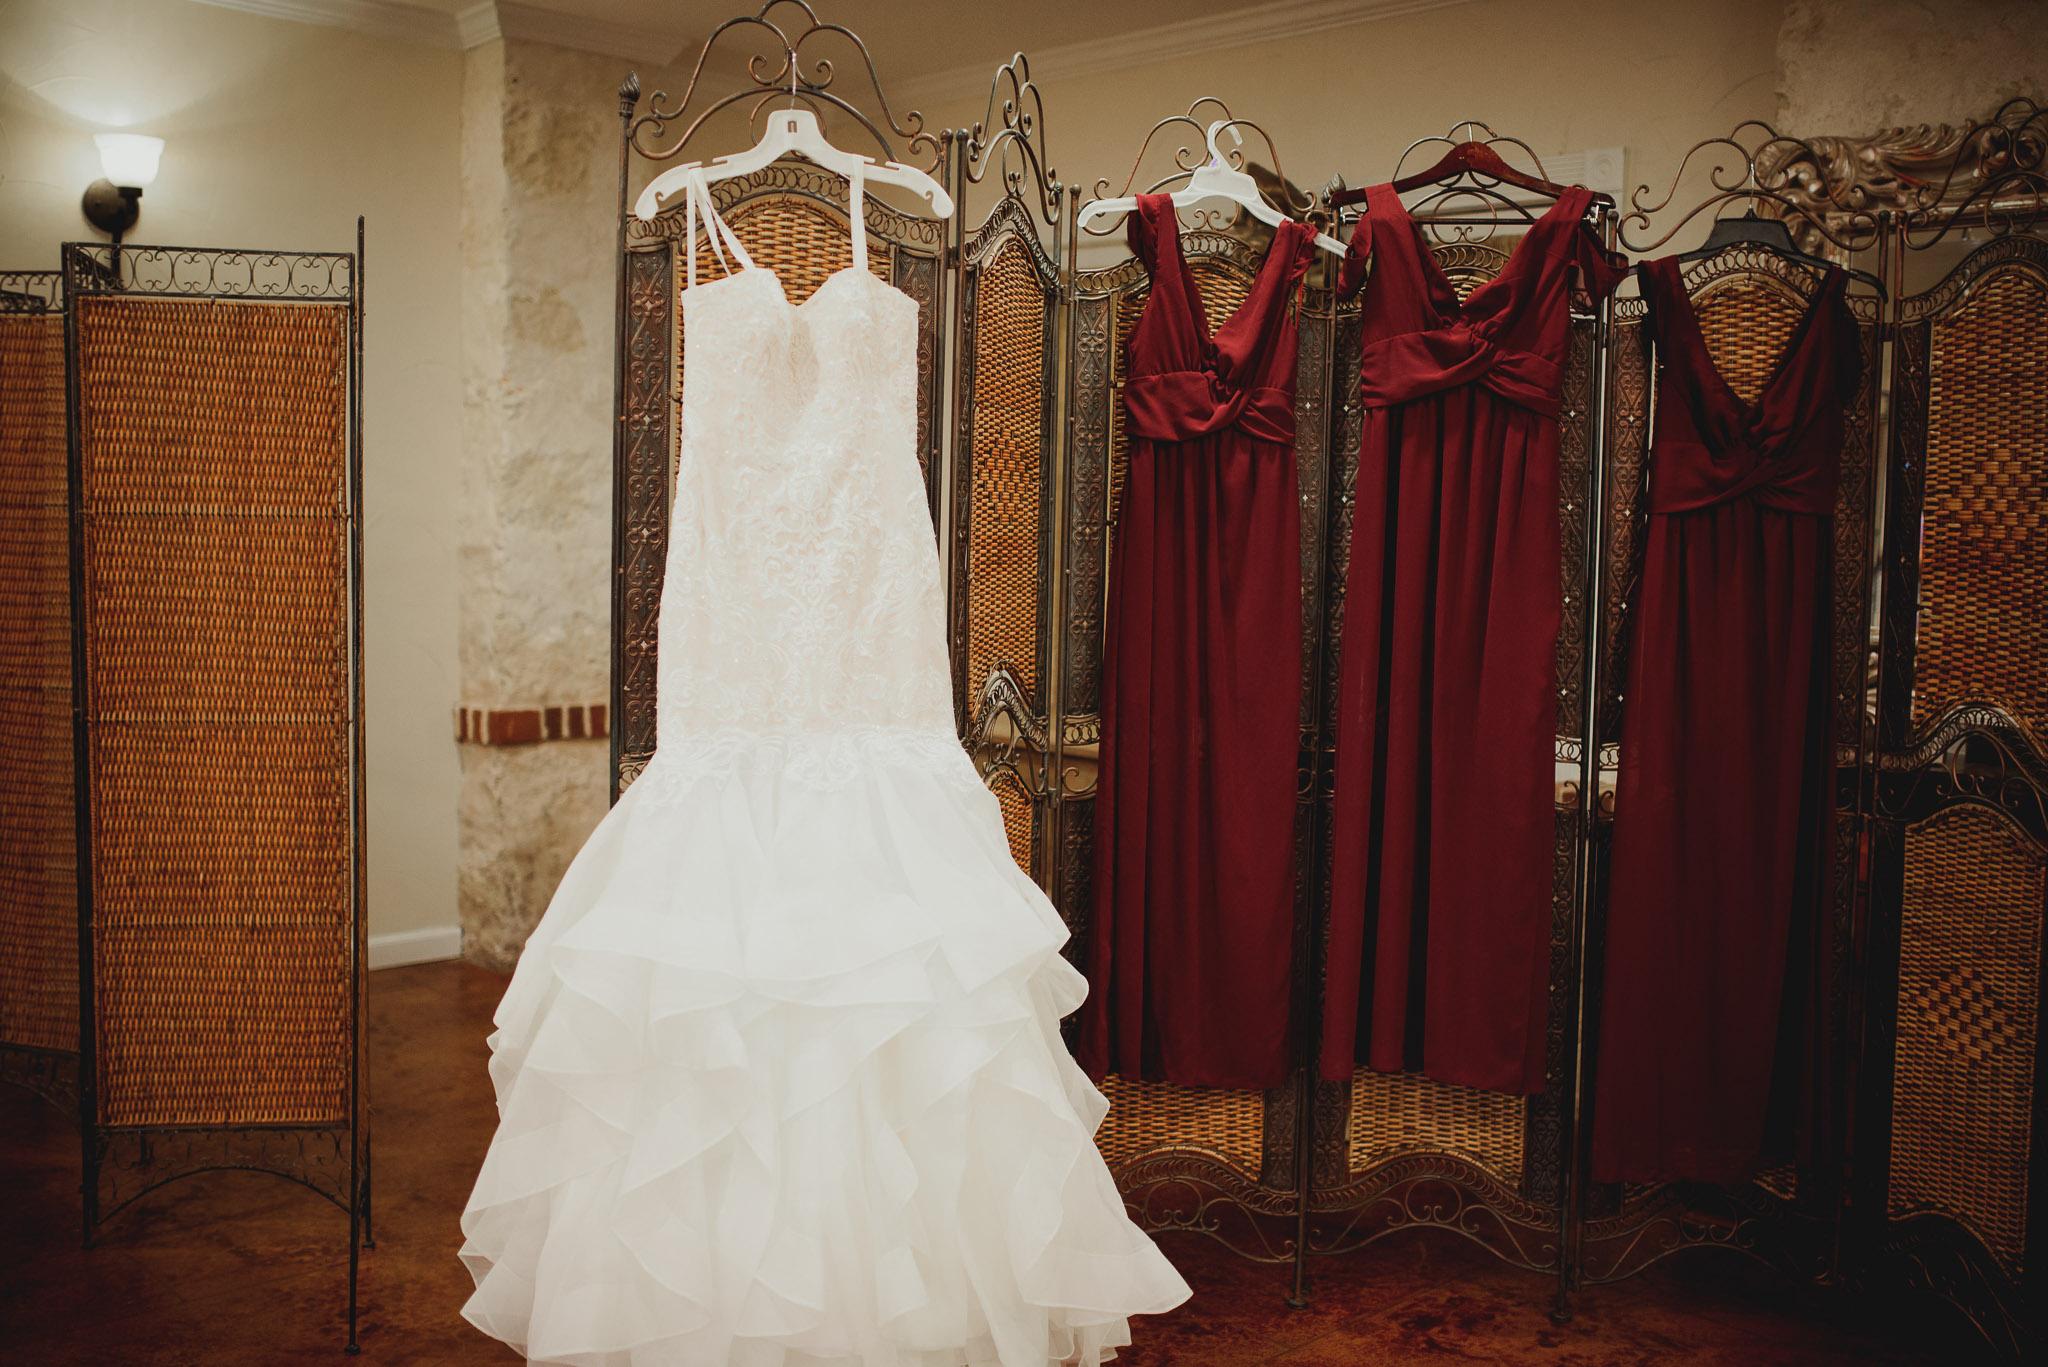 Austin-Texas-Wedding-Vintage-Villas-0001.jpg